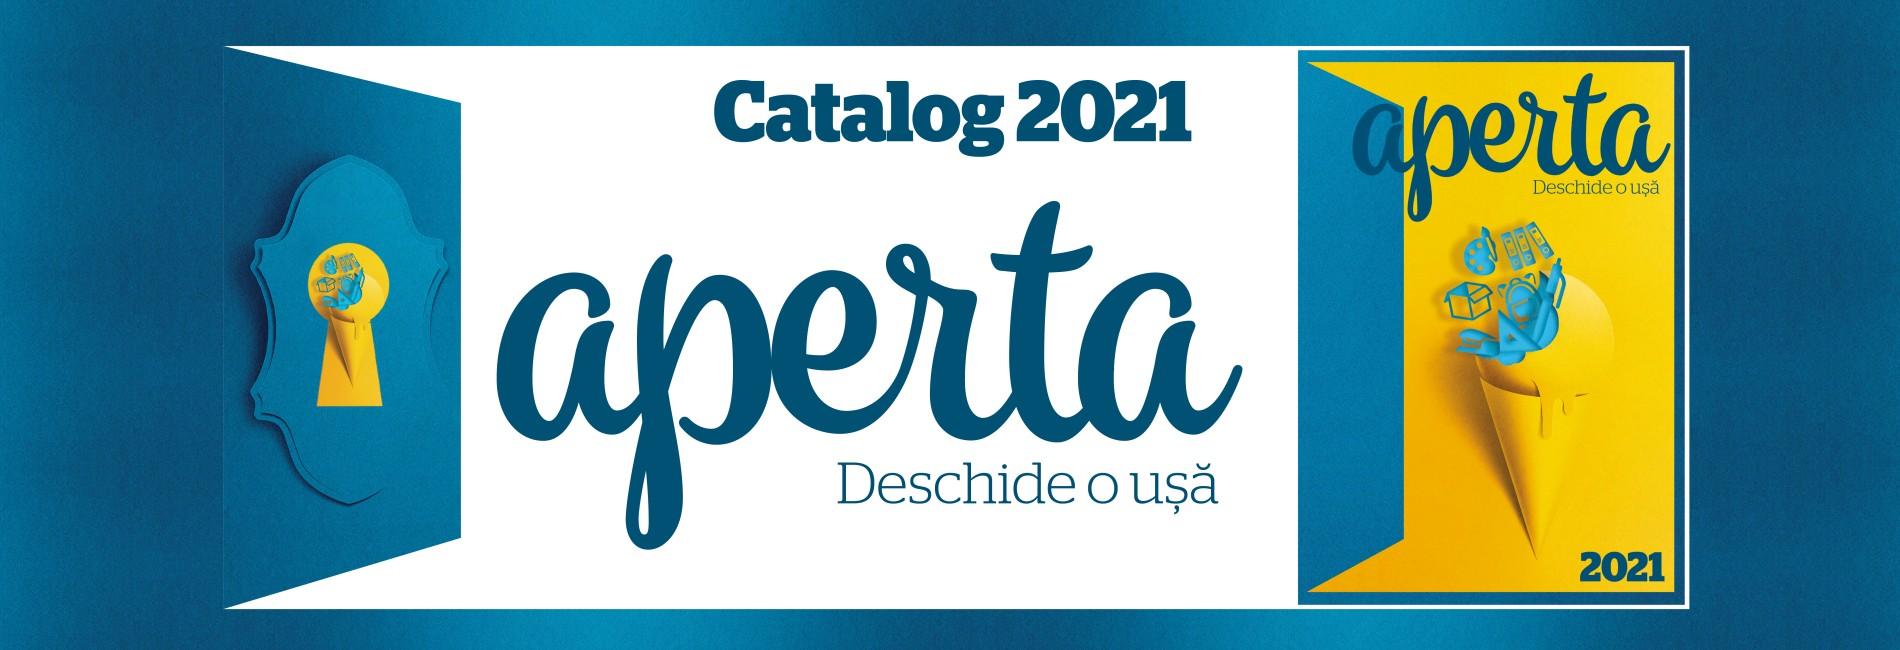 Banner Catalog Aperta 2021